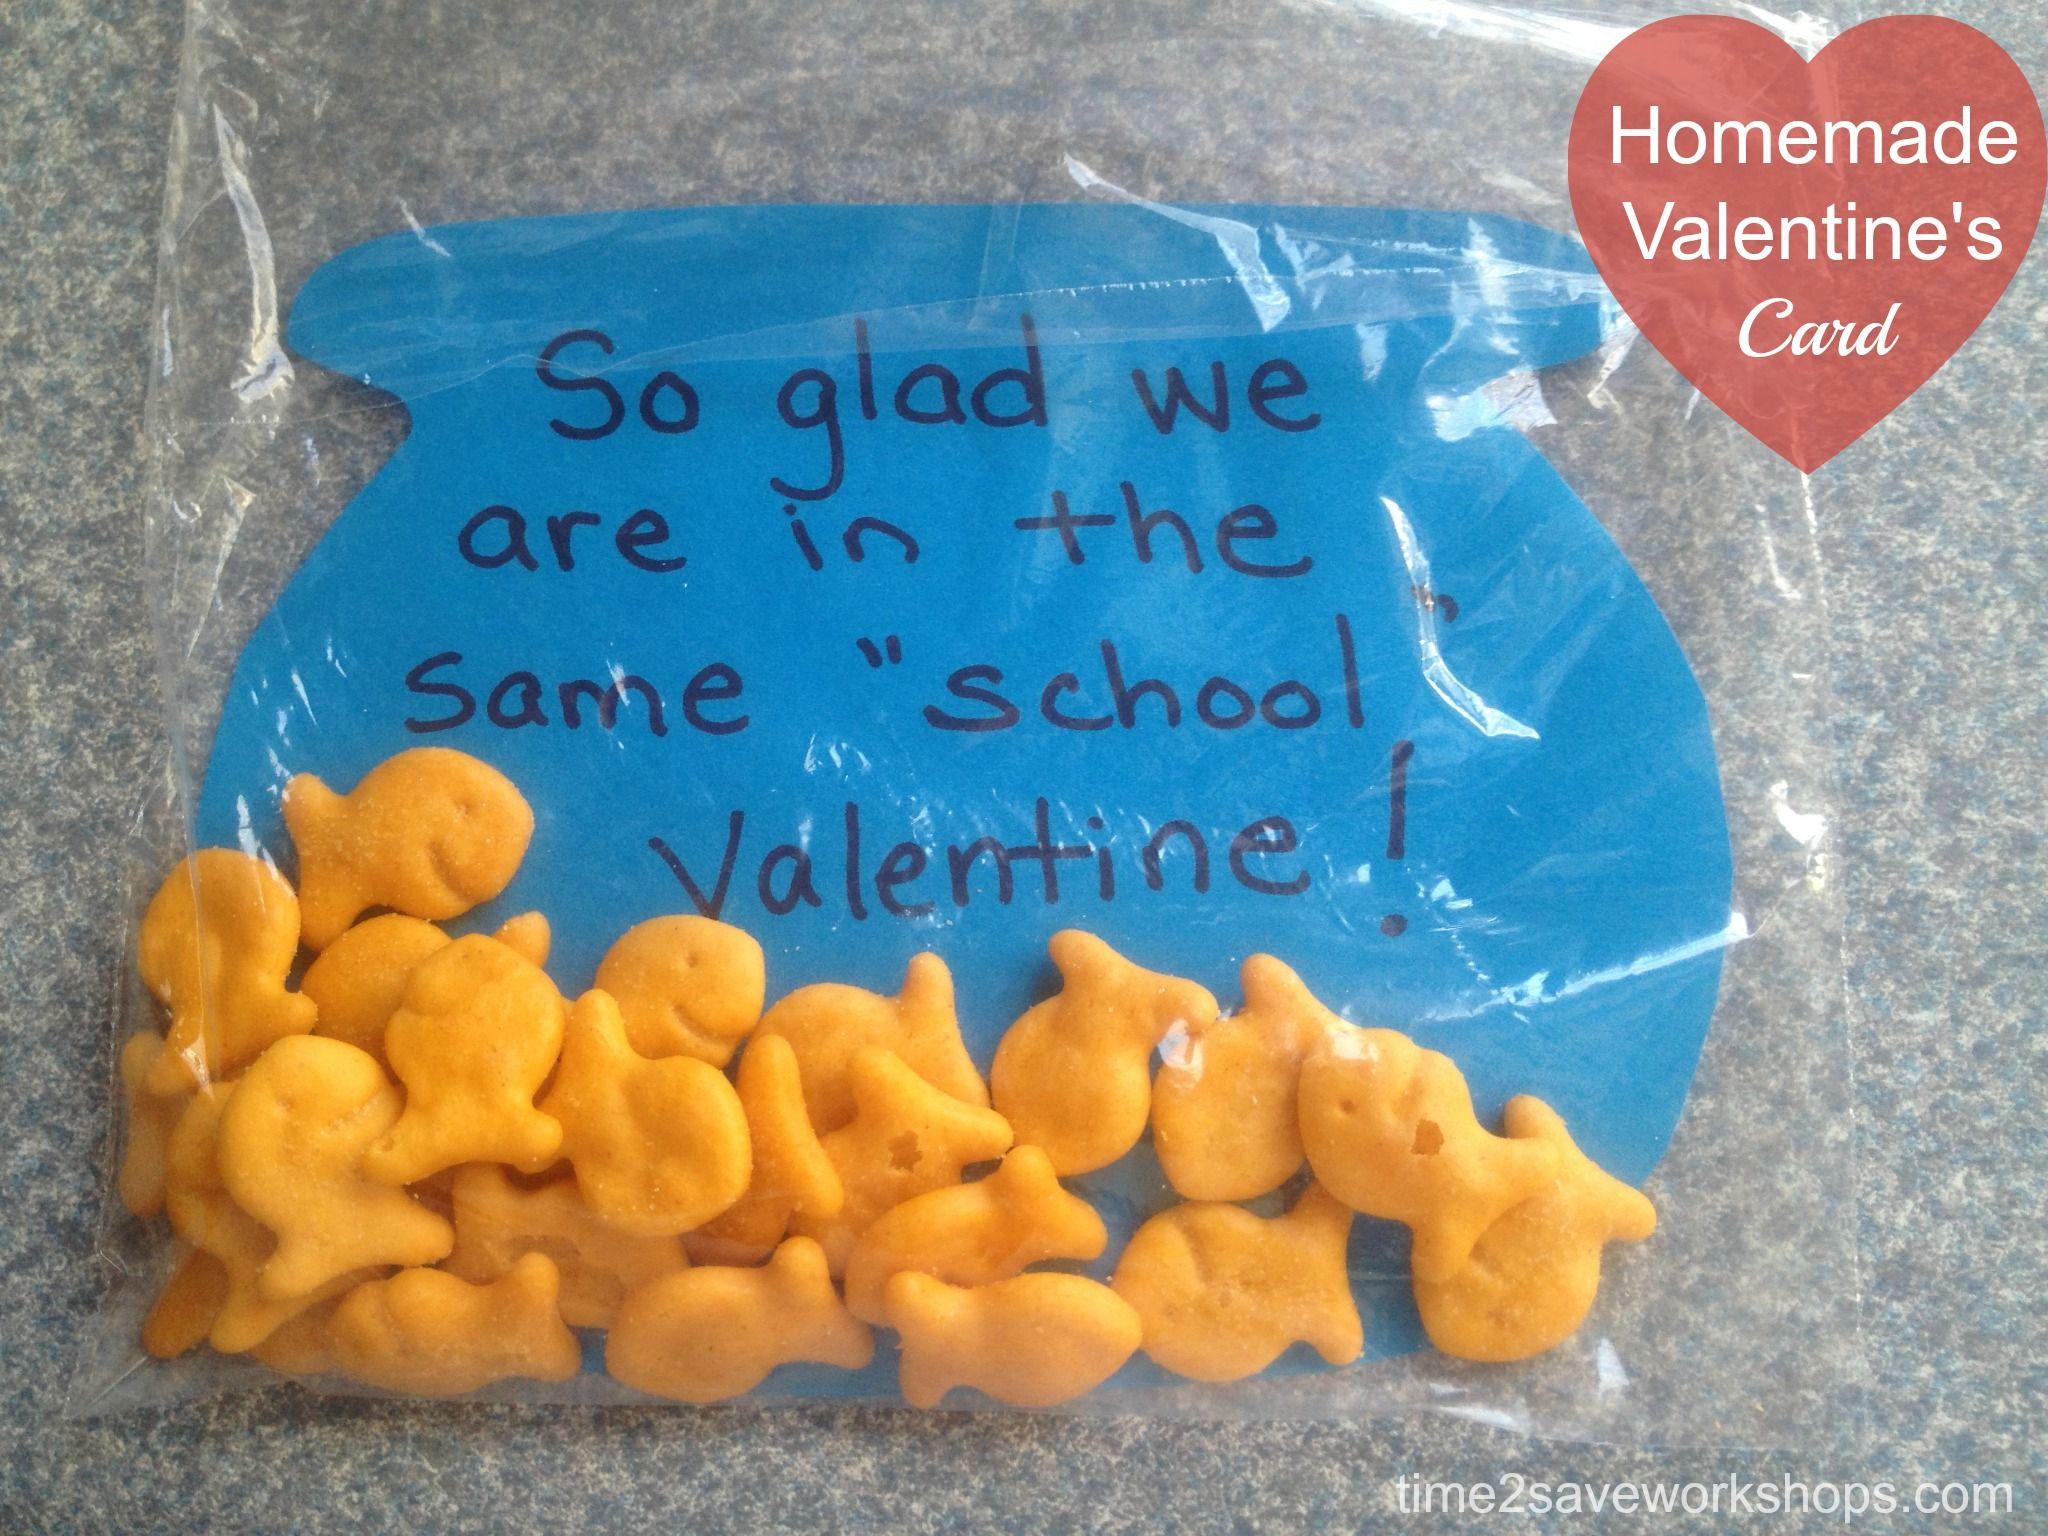 goldfish valentines day cards   Homemade Valentine Cards: DIY Goldfish Valentine's Day Greetings ...